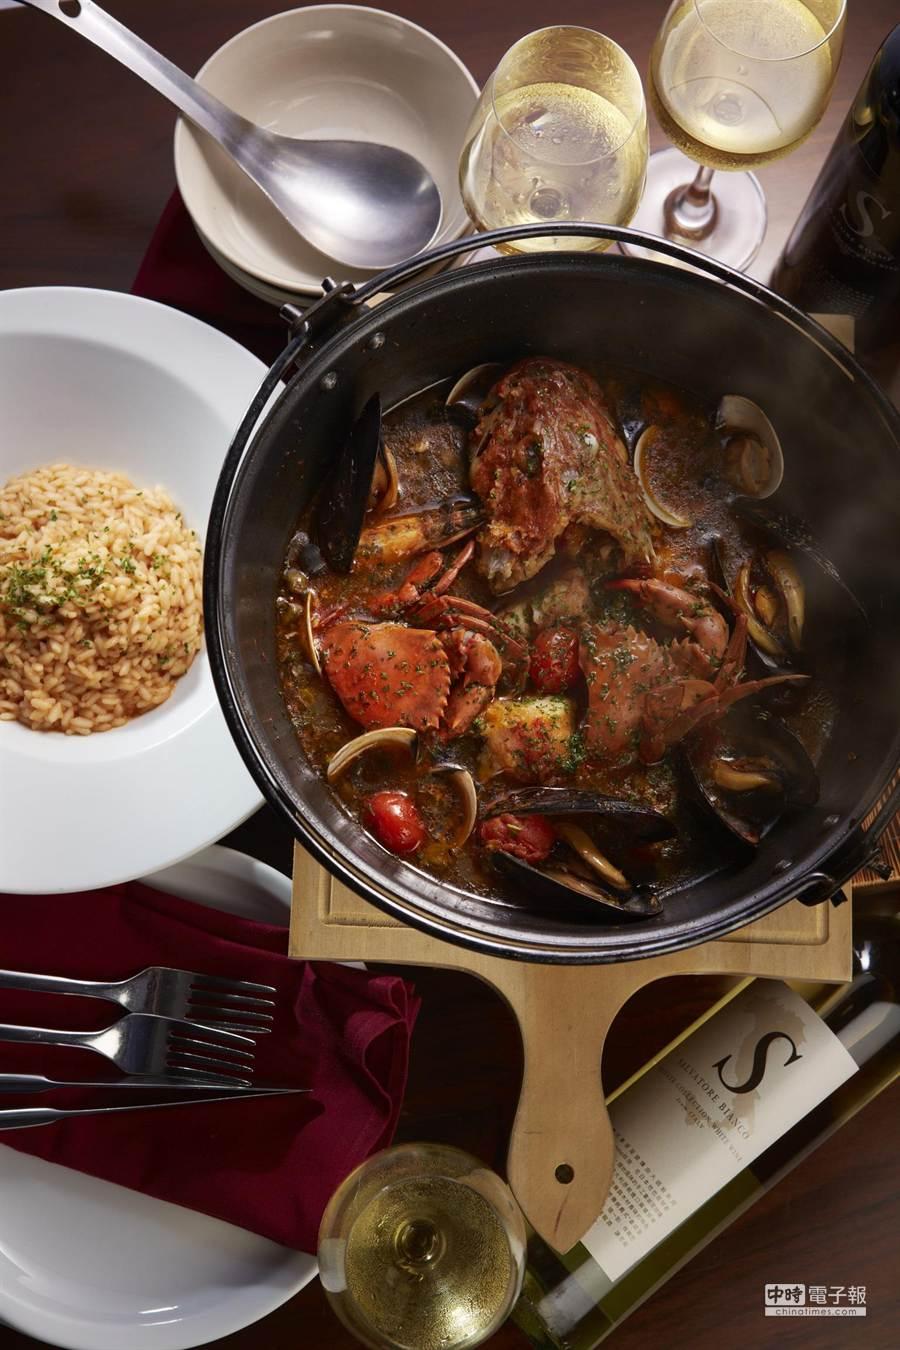 SALVATORE CUOMO & BAR 薩瓦托雷義式餐廳開店周年,推出紀念套餐。(業者提供)